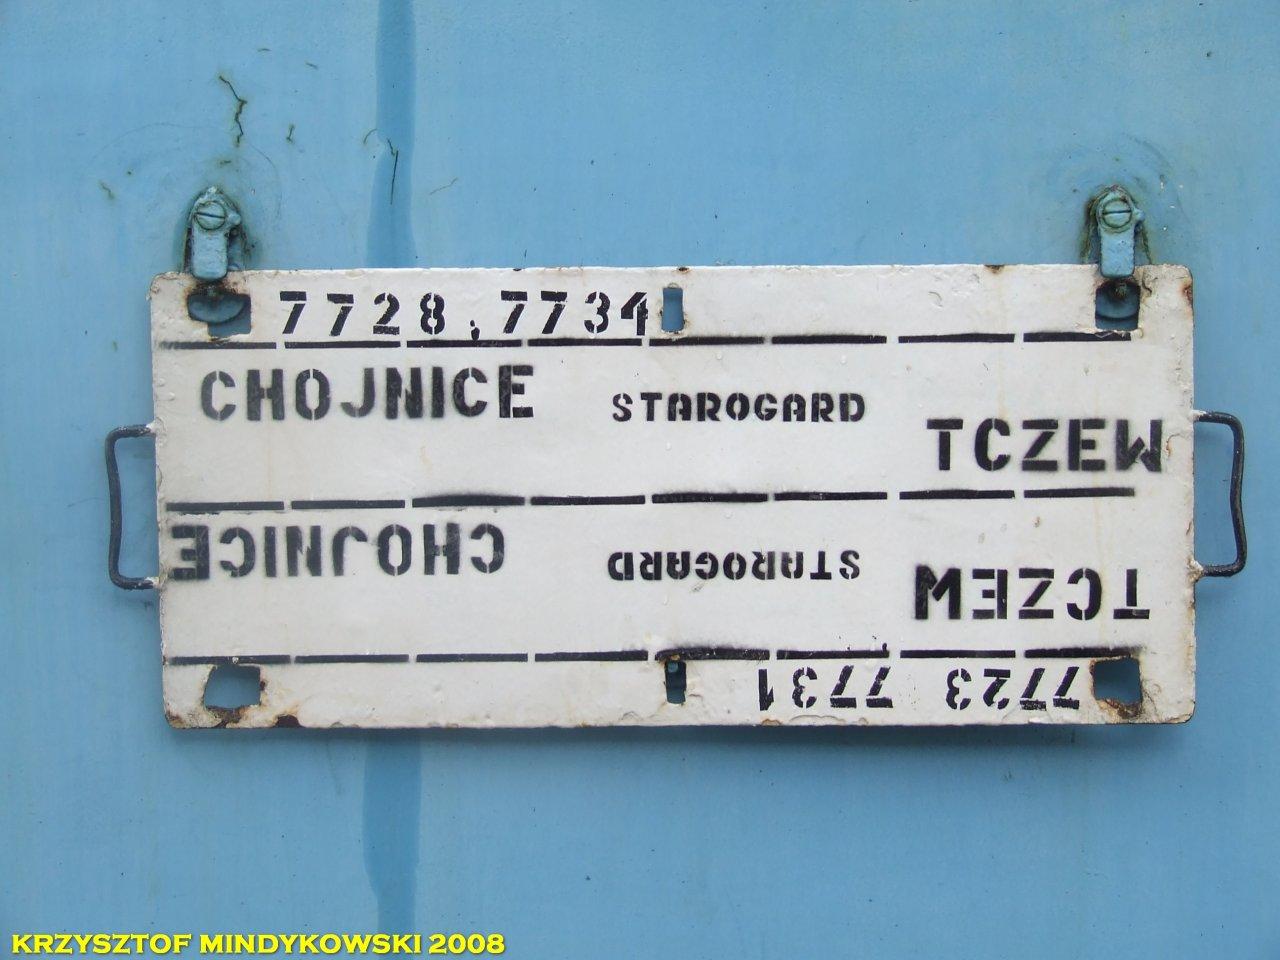 TABLICA CHOJNICE-TCZEW.jpg